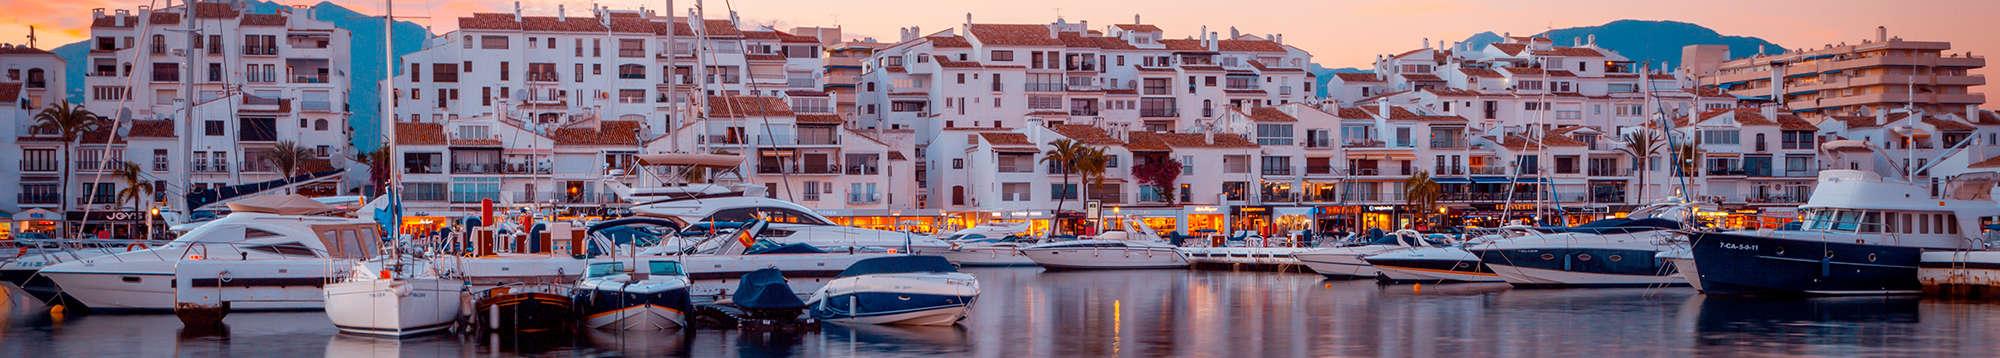 escapadas fin de semana en marbella